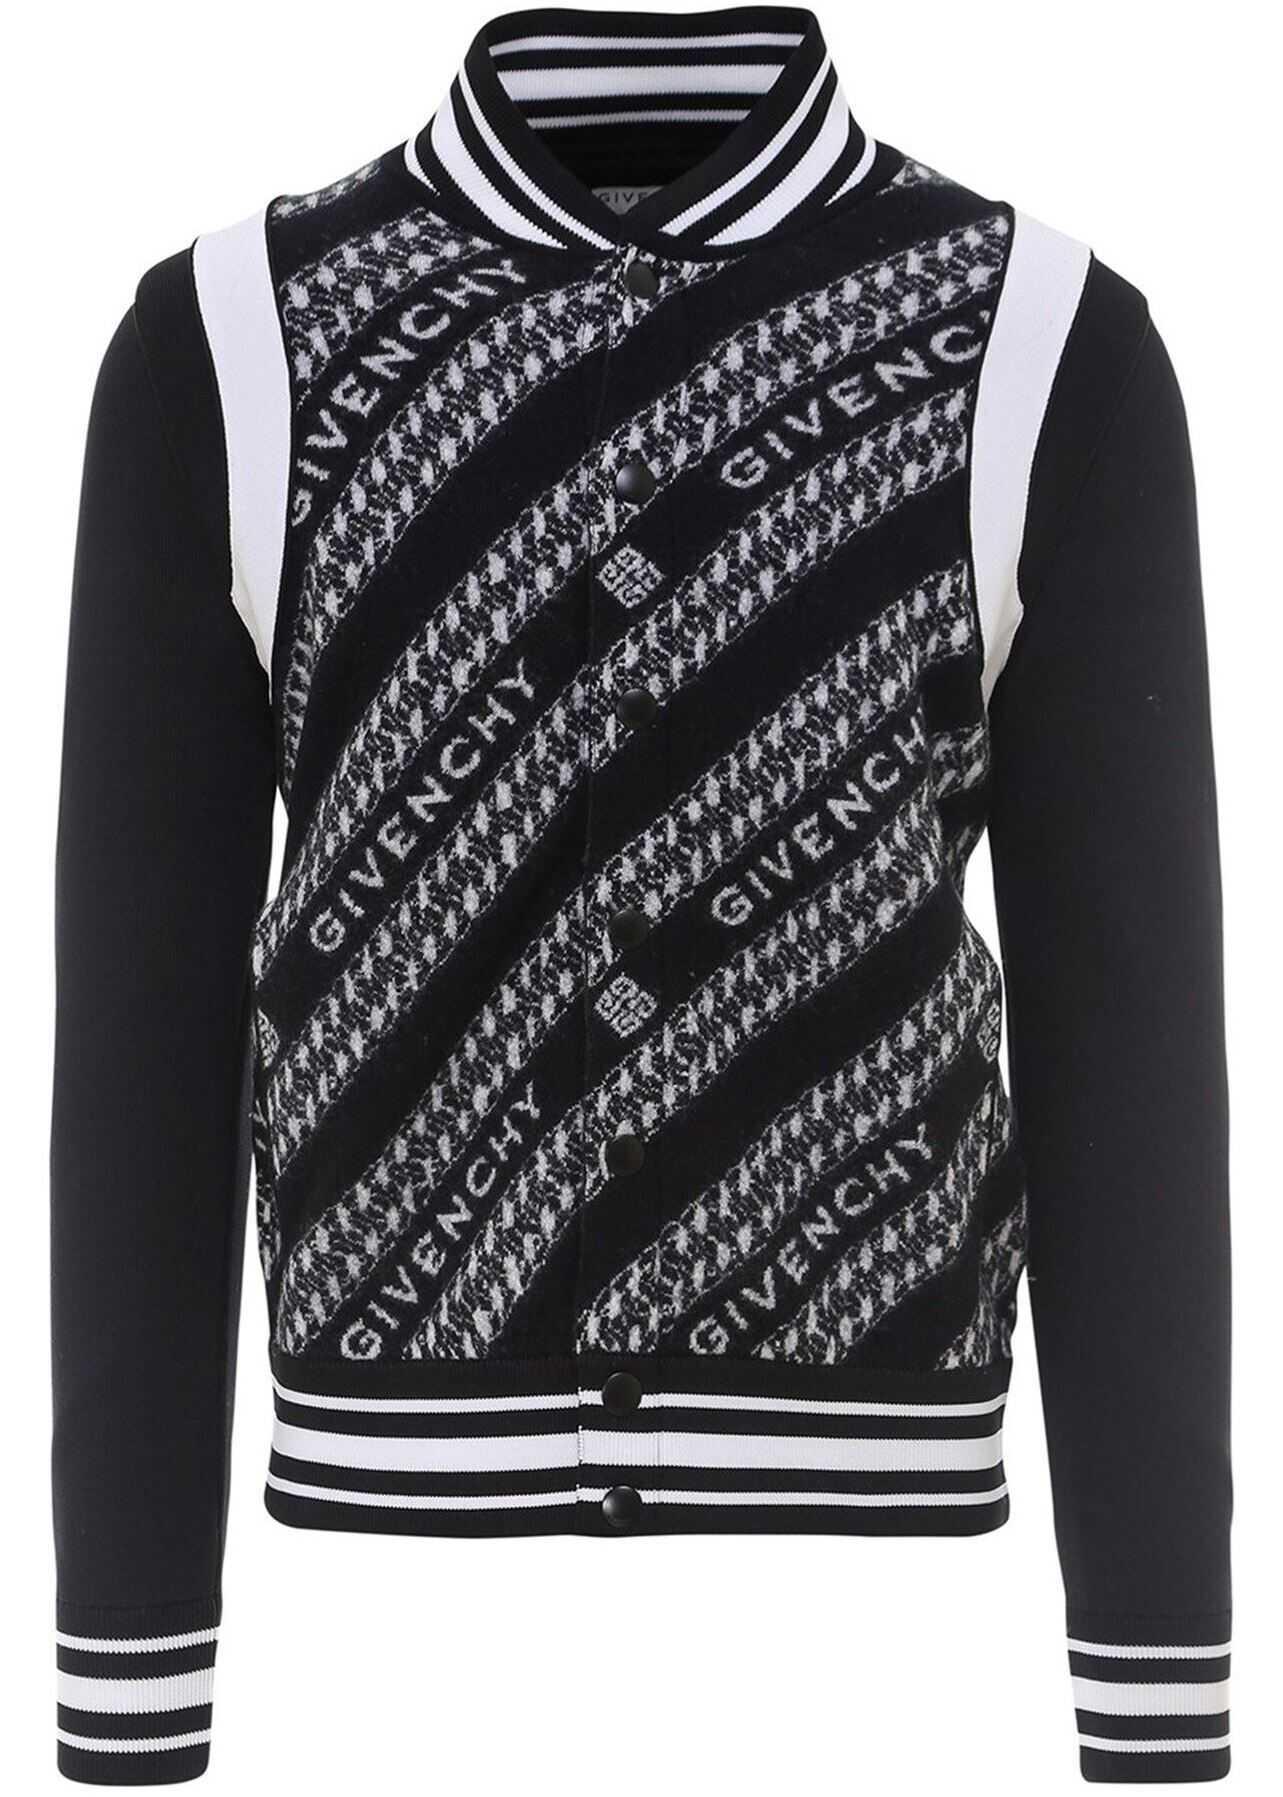 Givenchy Chaîne Bomber Jacket In Black Black imagine